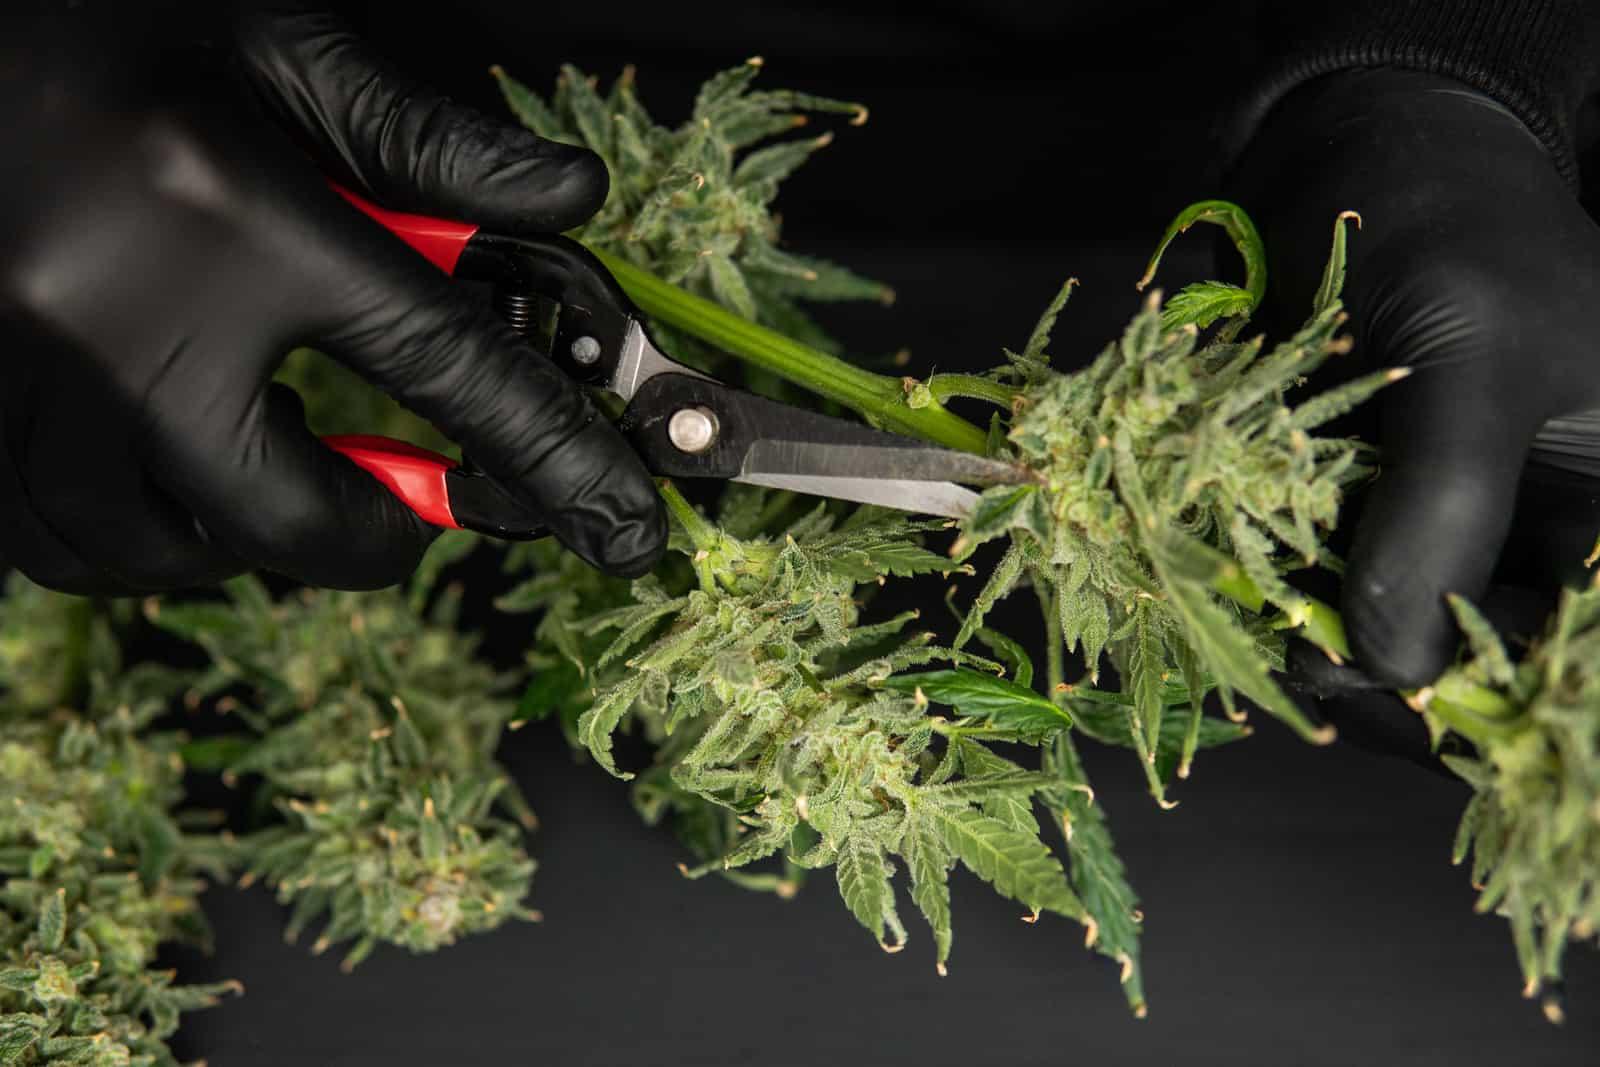 New Hampshire Cannabis Jobs and Cannabis Careers. Hands trimming a marijuana bud.